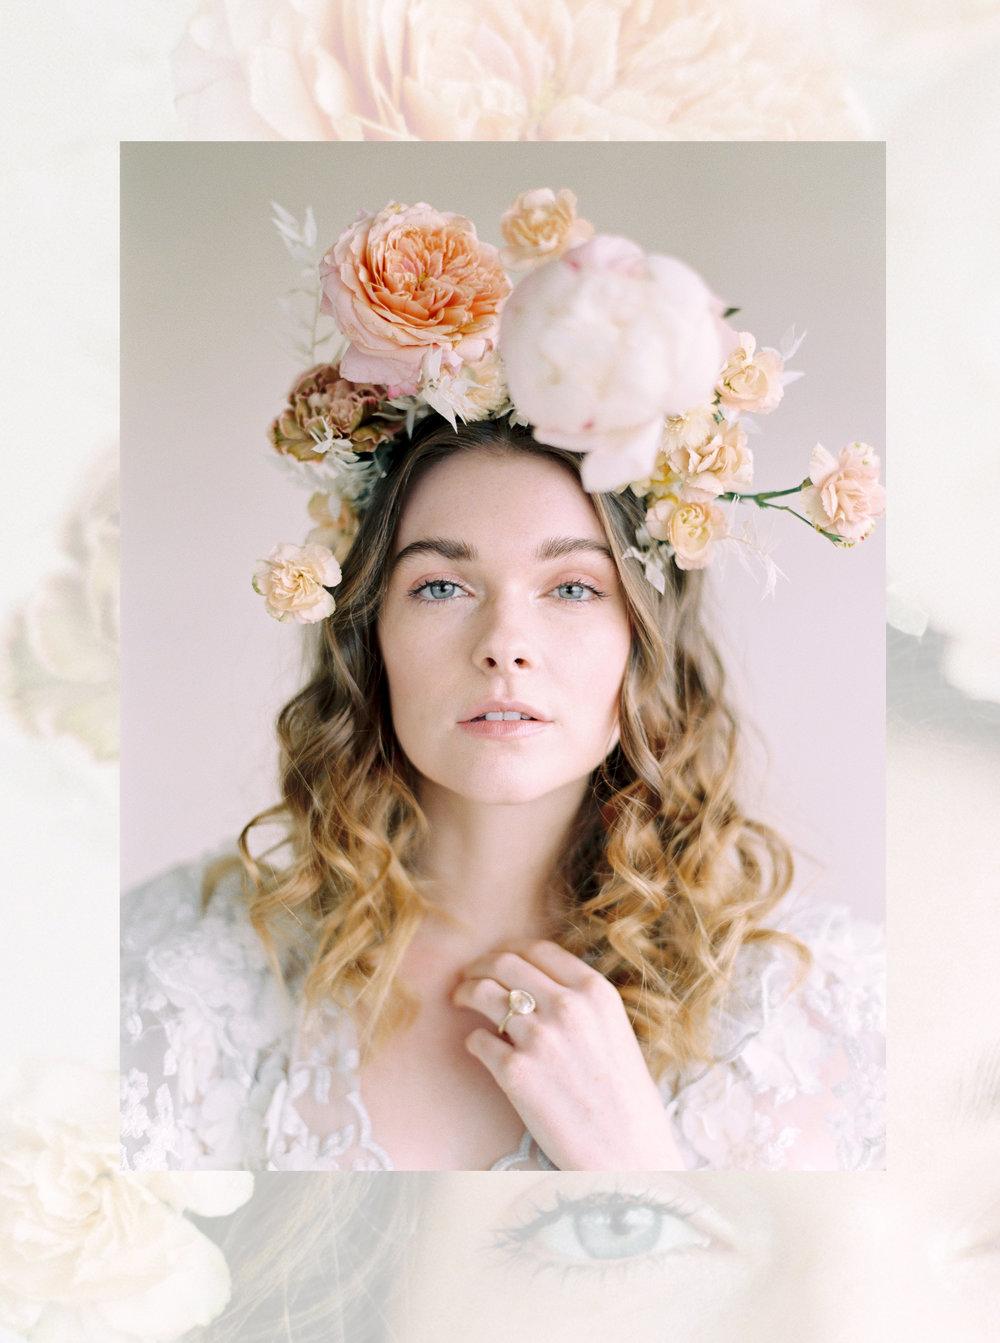 Katie-Nicolle-Photography-110-fun.jpg